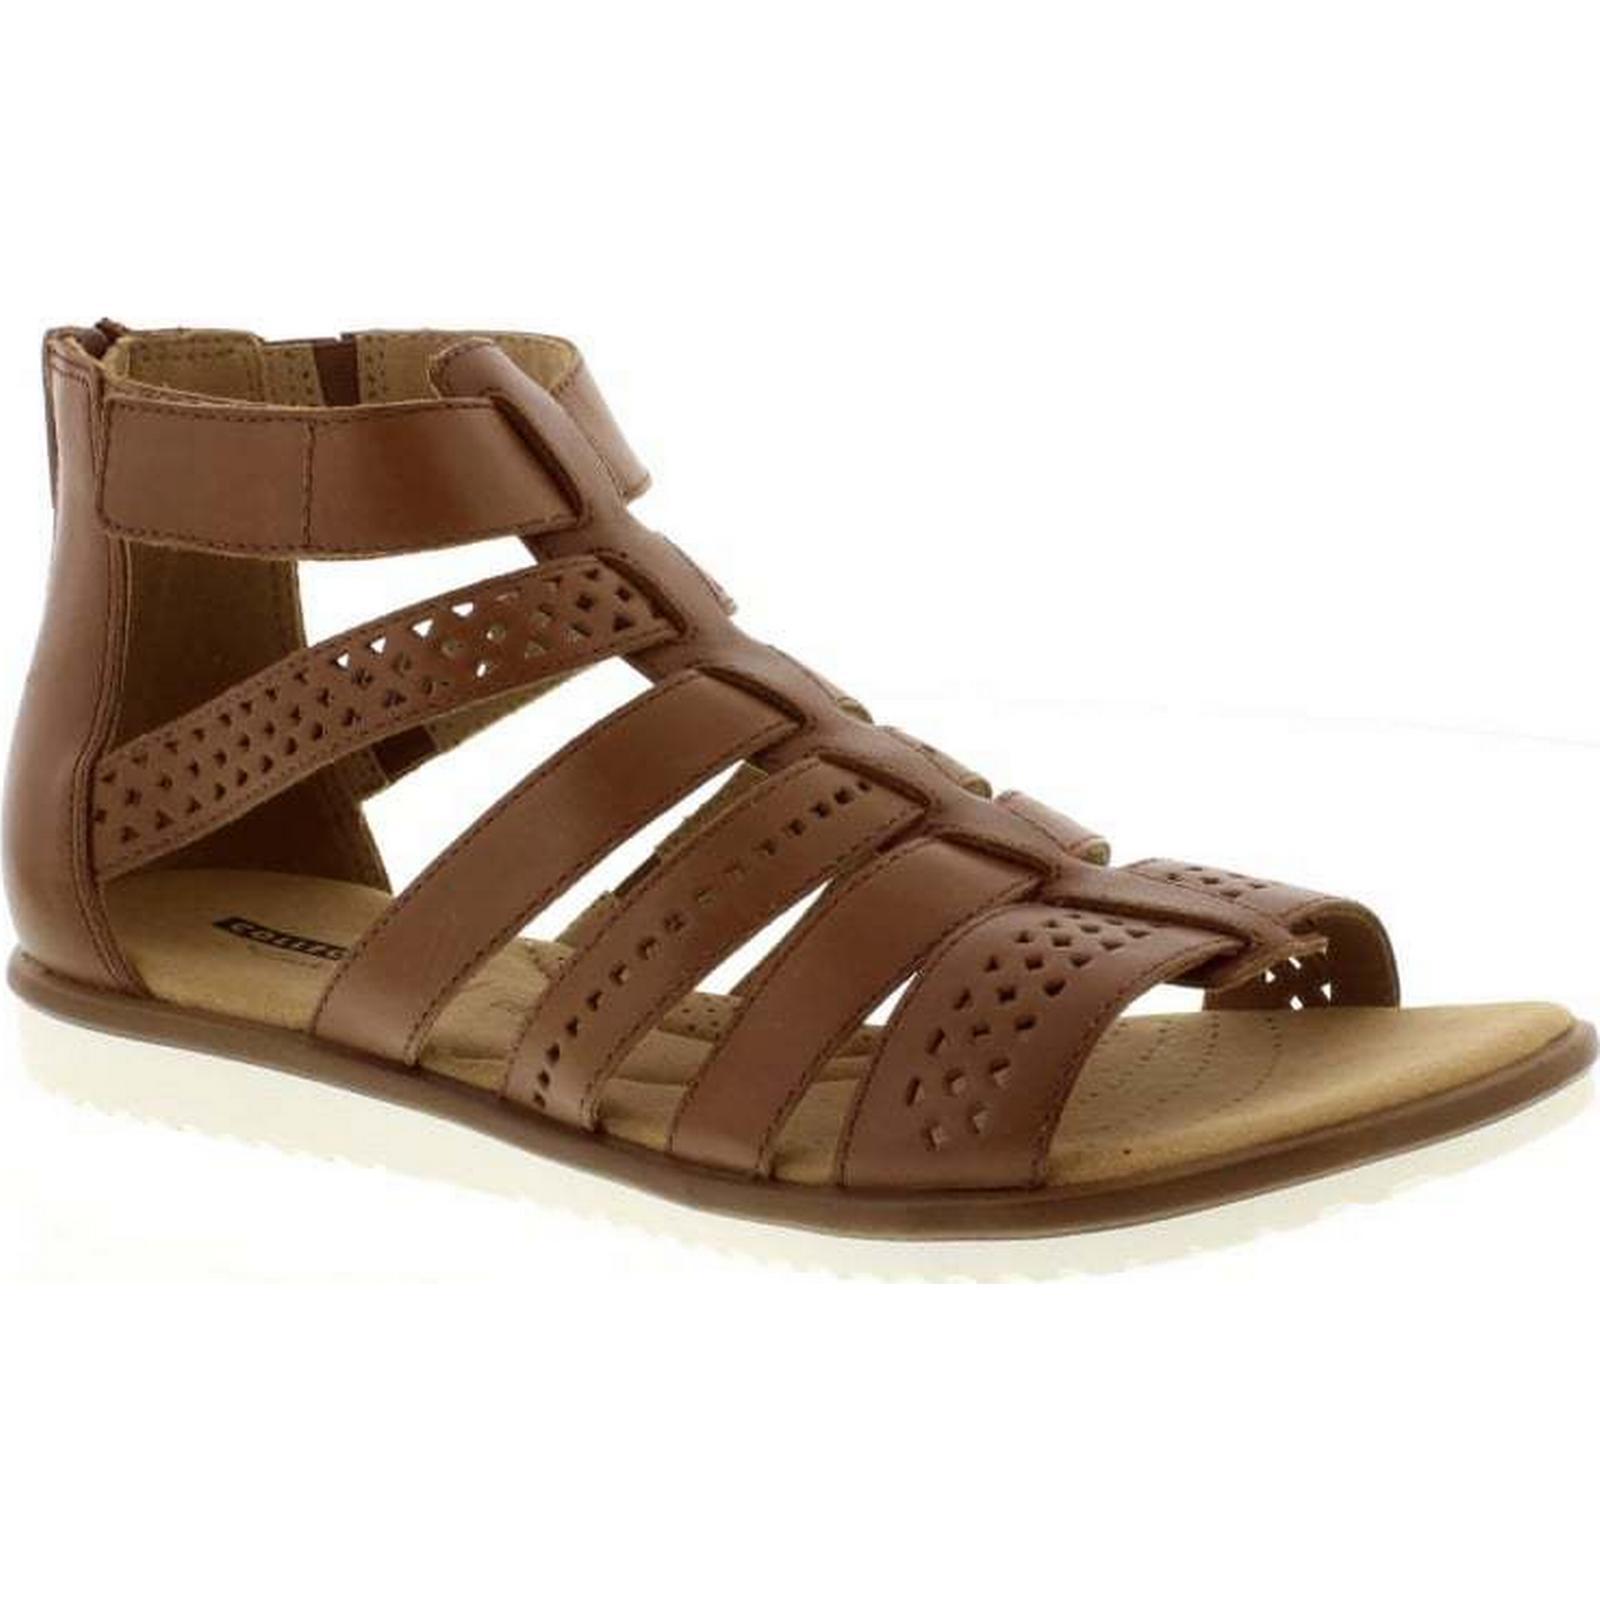 Clarks Kele Size: Lotus - Tan Leather Size: Kele 7 UK 3c563f